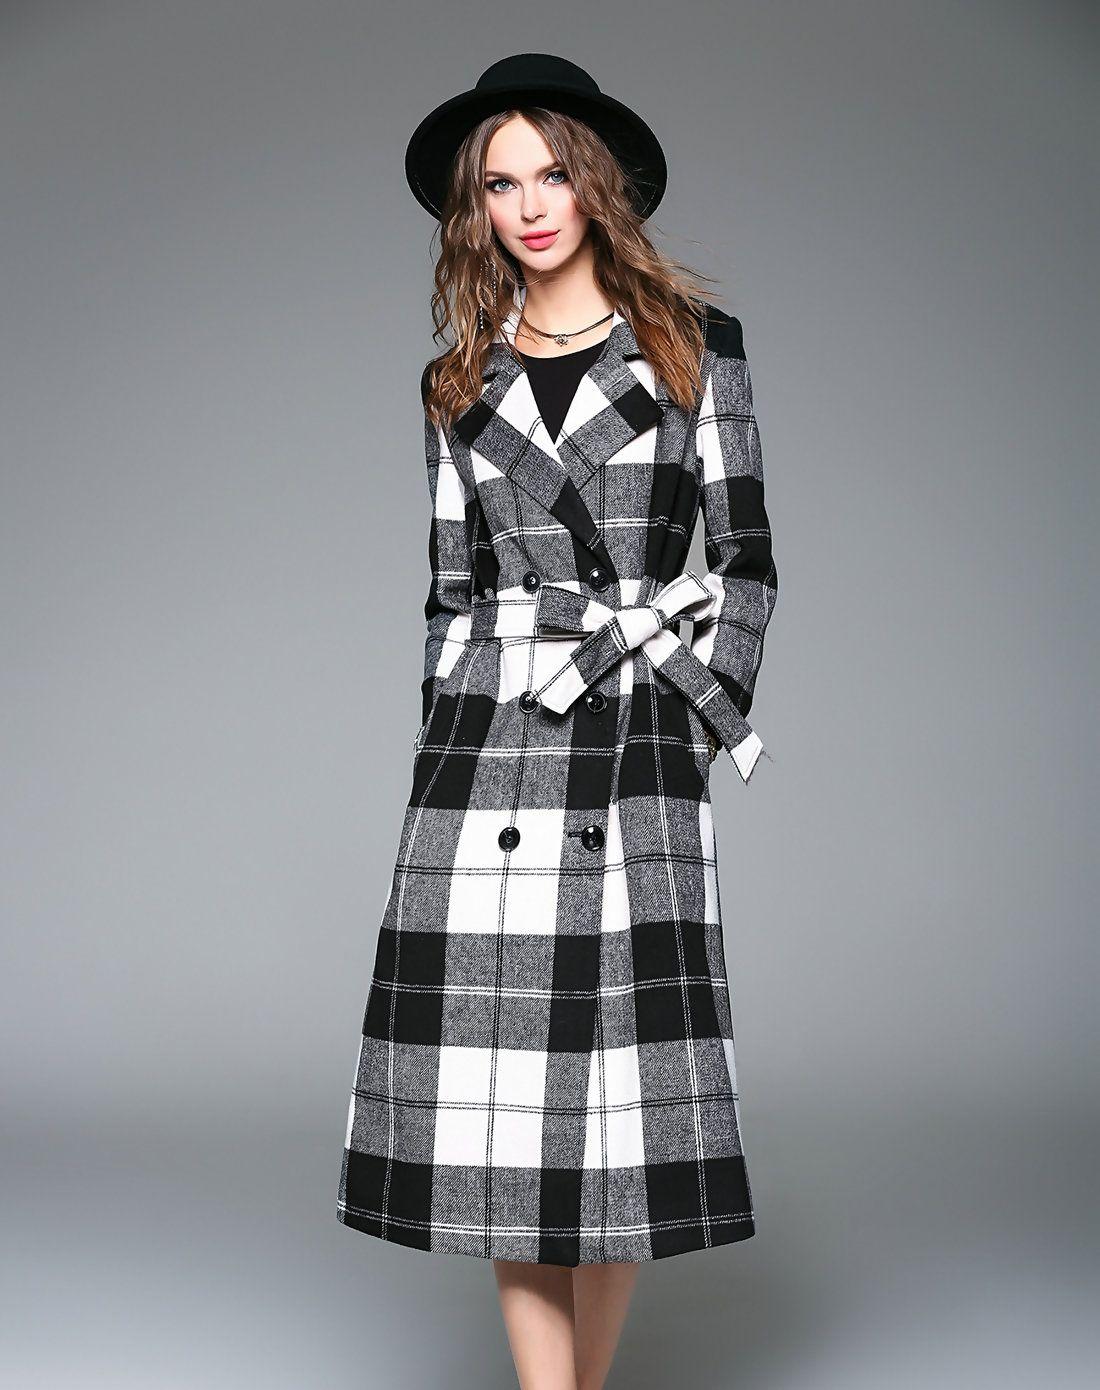 Adorewe queen mulock plaid turndown collar waist tied long coat with